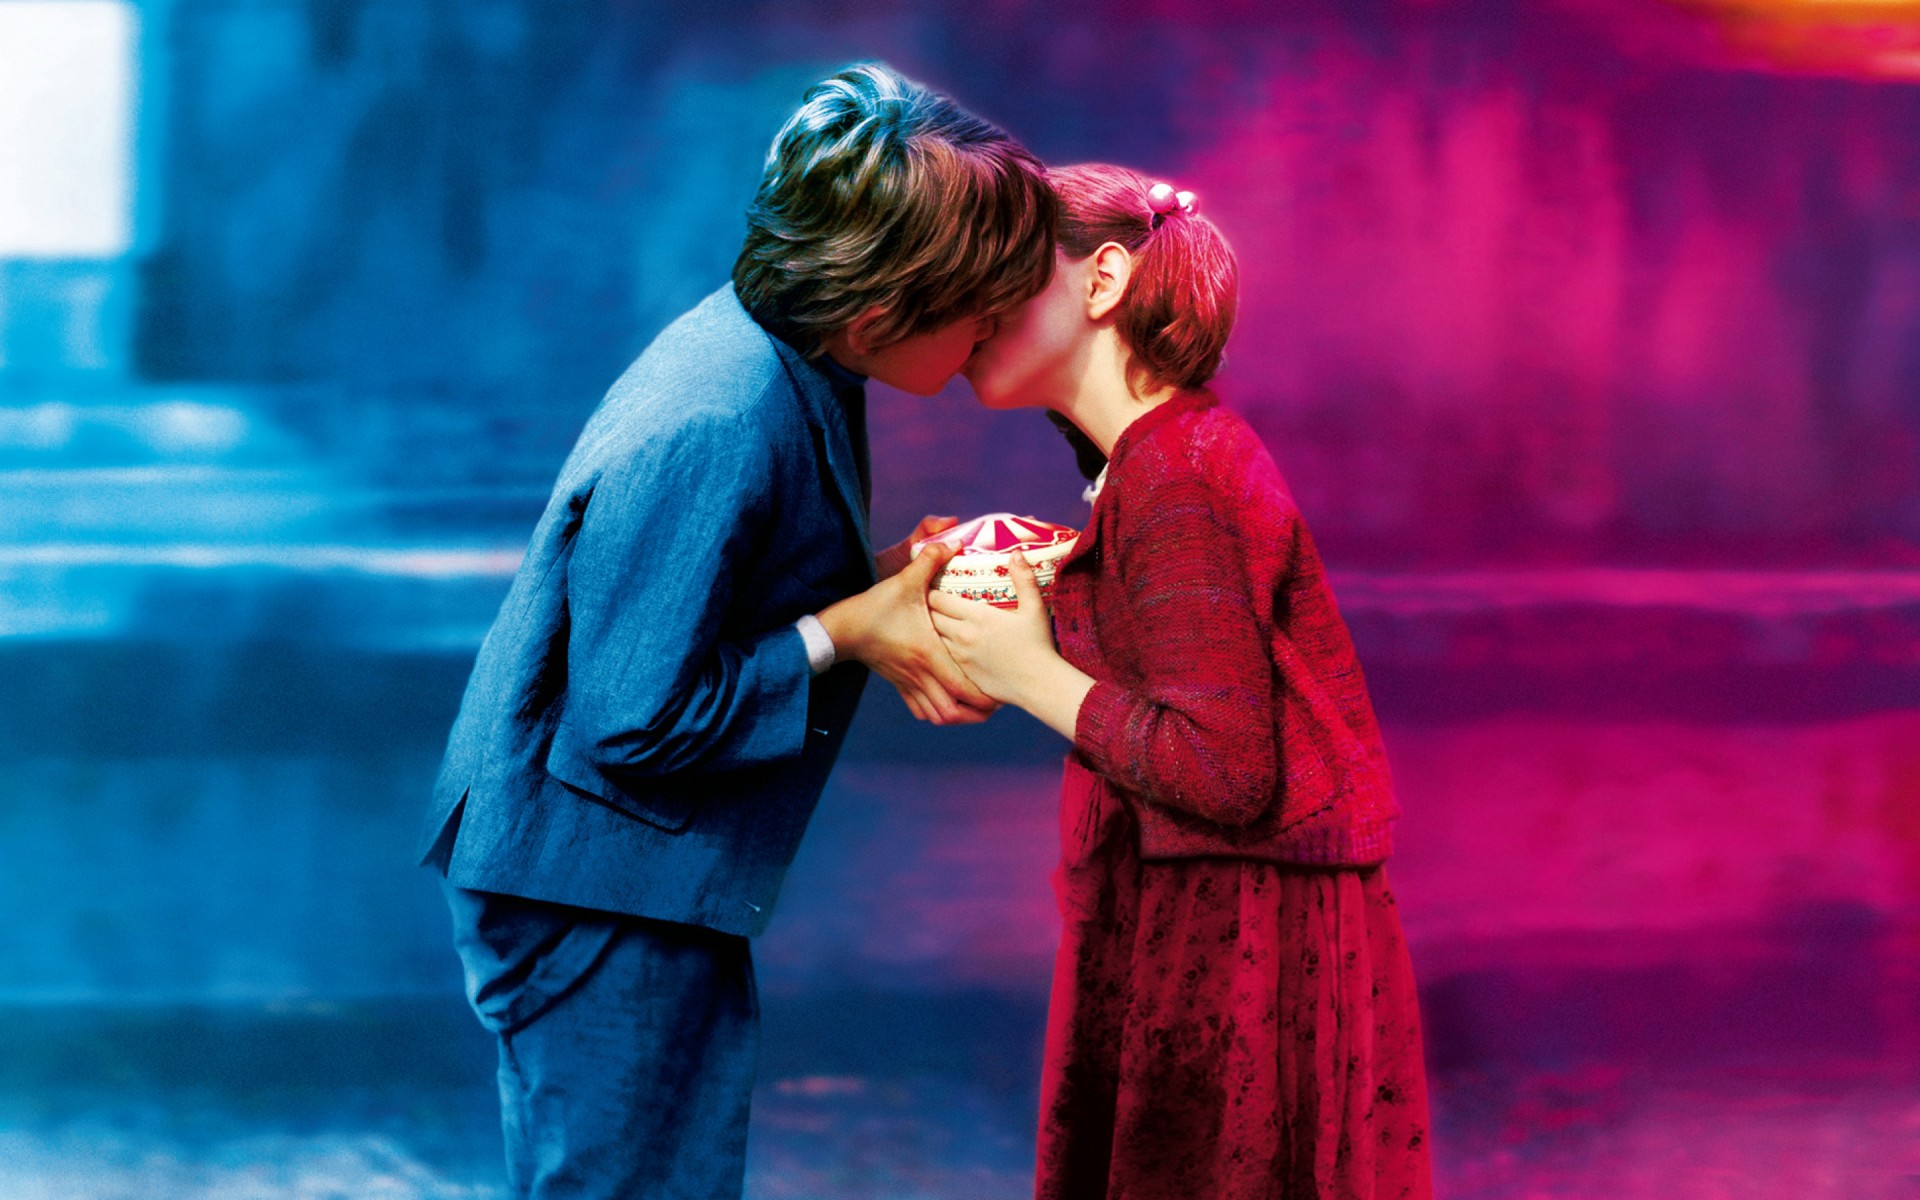 Cute Boy And Girl Love Hd Wallpapers Boy Girl Cute Kiss Wallpapers Hd Wallpapers Id 13929